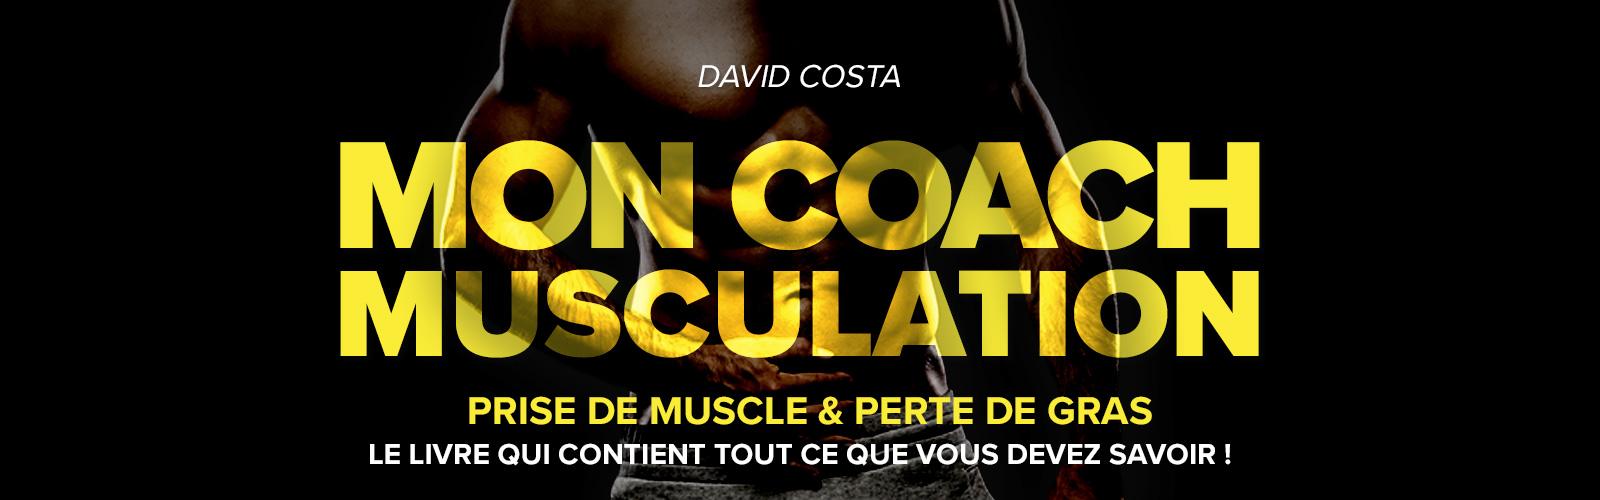 Slide_Mon-coach-musculation